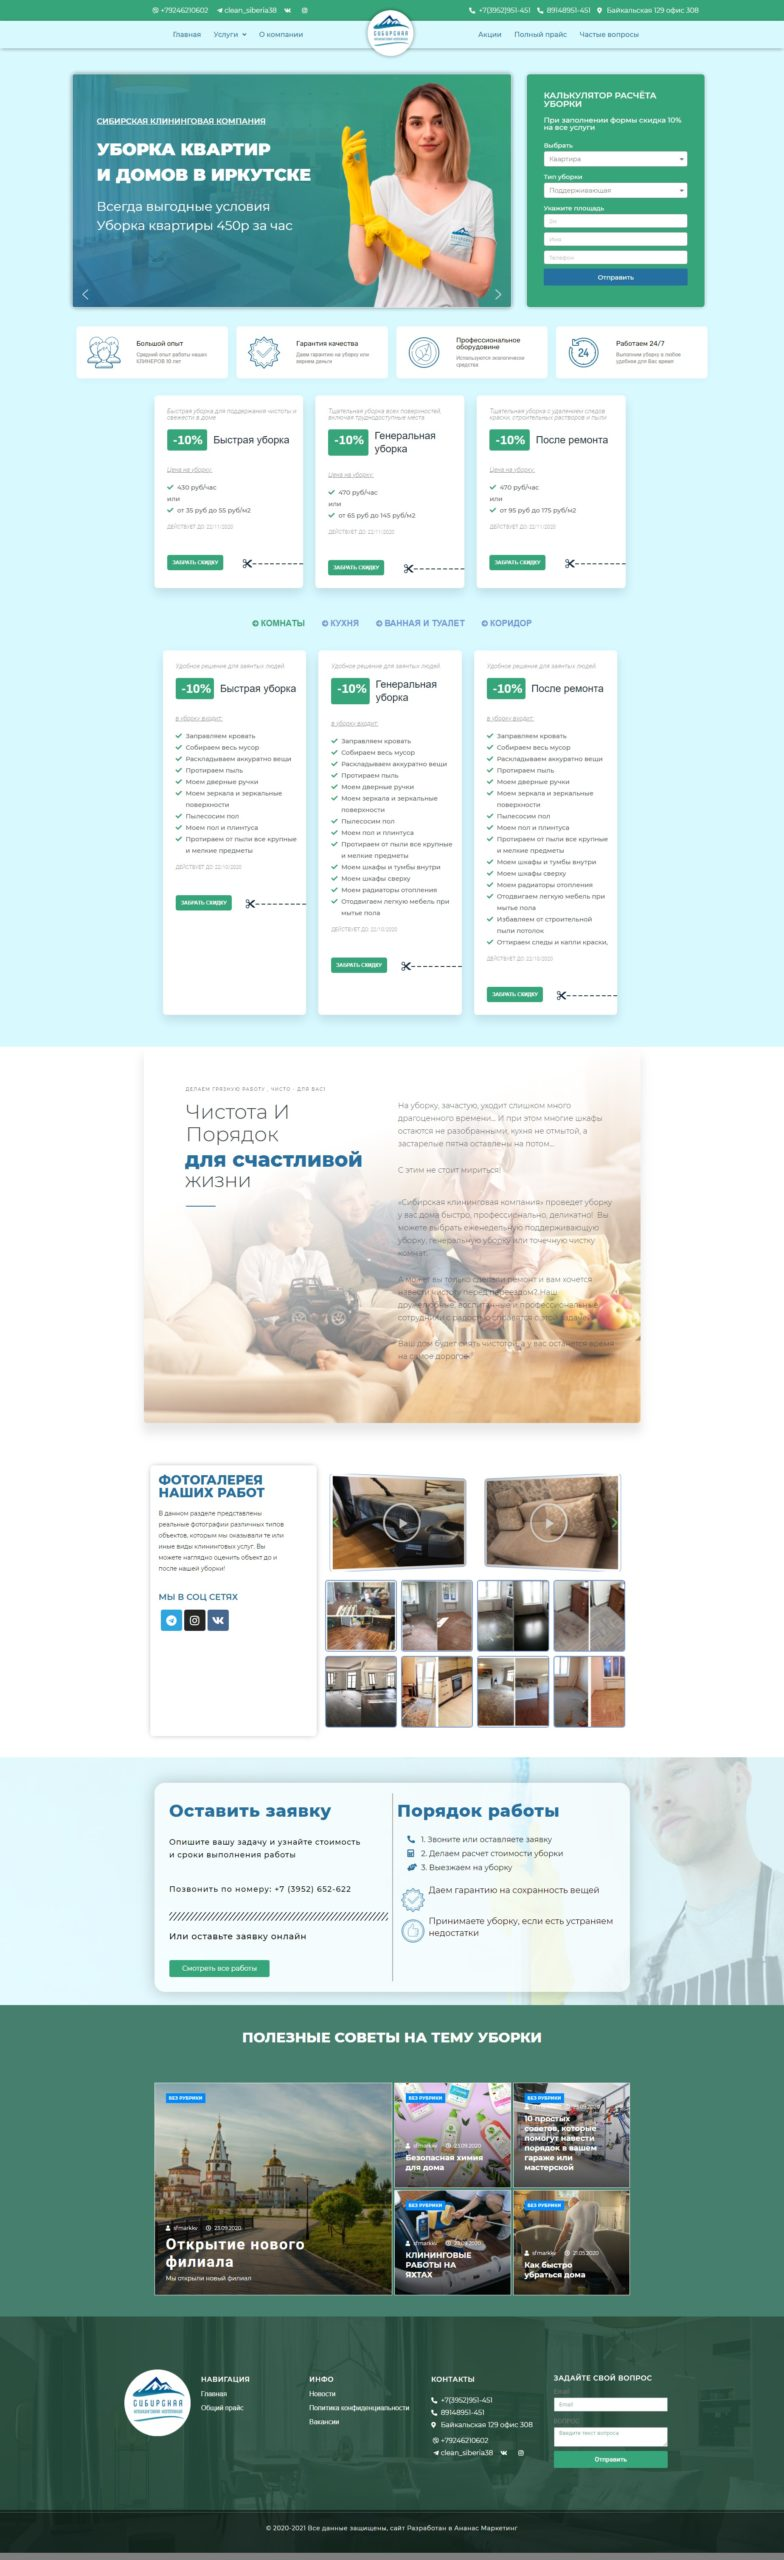 Готовый сайт - Уборка квартир и домов - Уборка квартир в Иркутске - ckk-38.ru